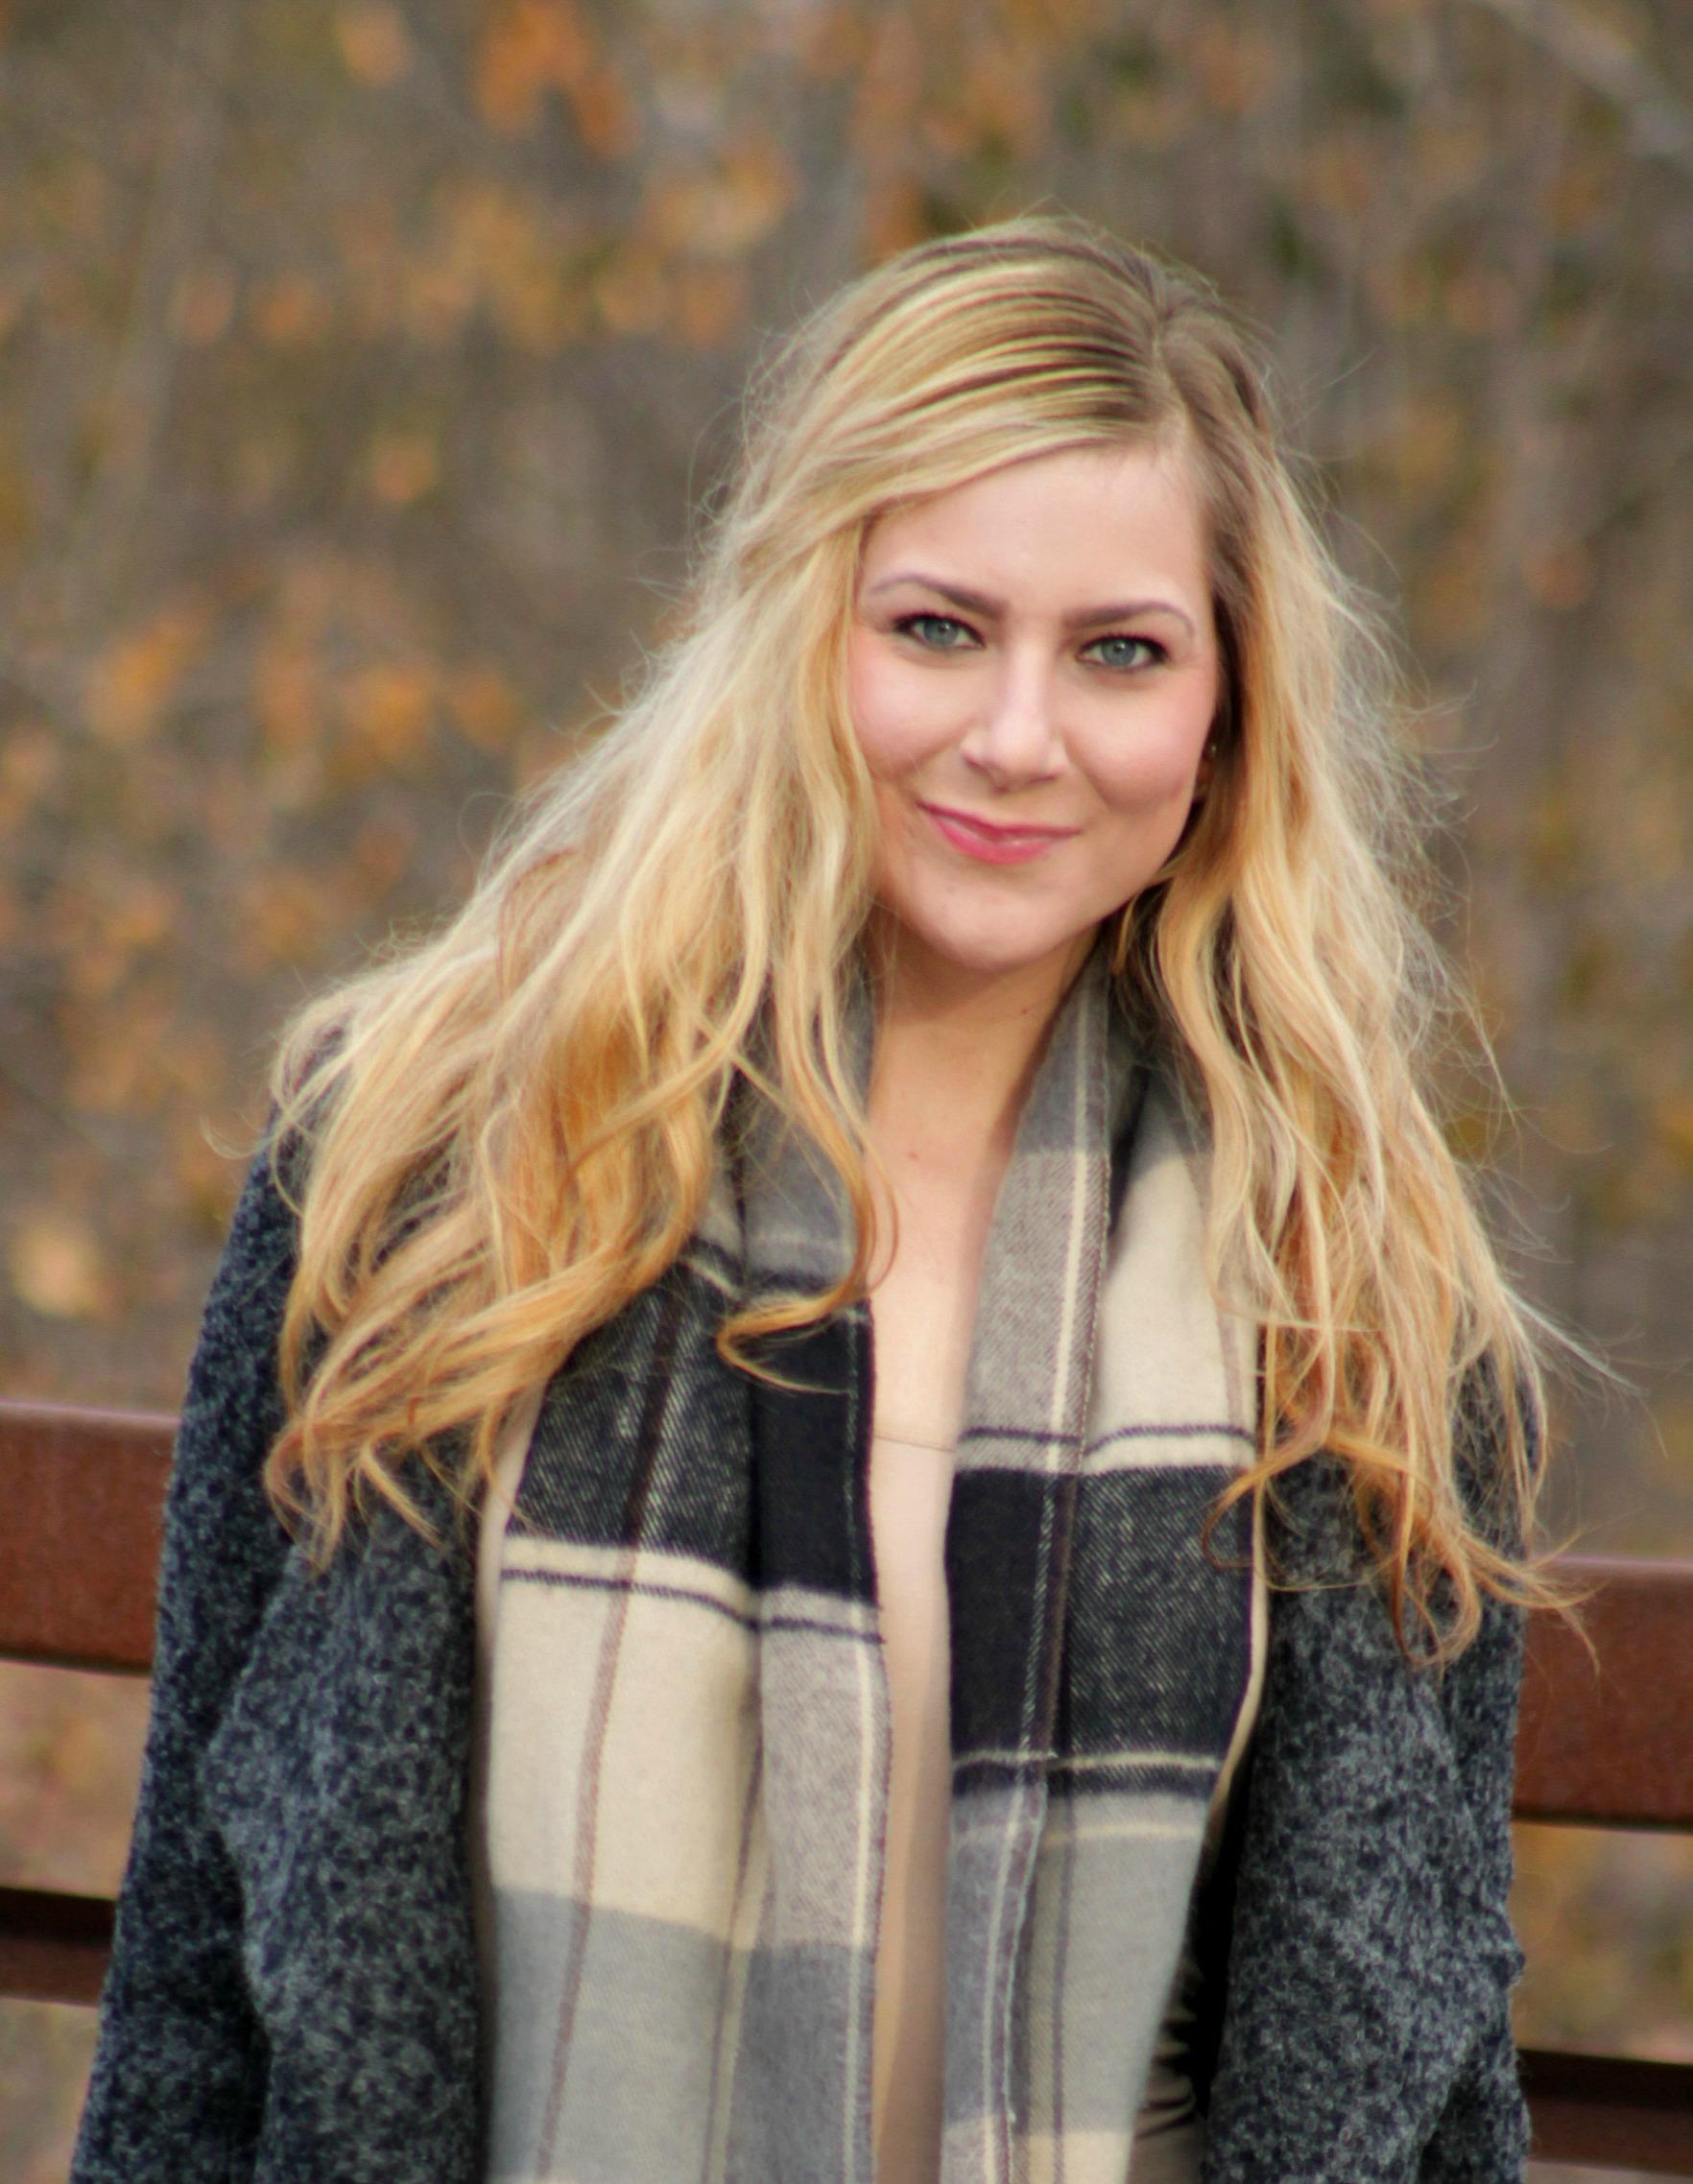 Oversized lapel tweed jacket + plaid scarf